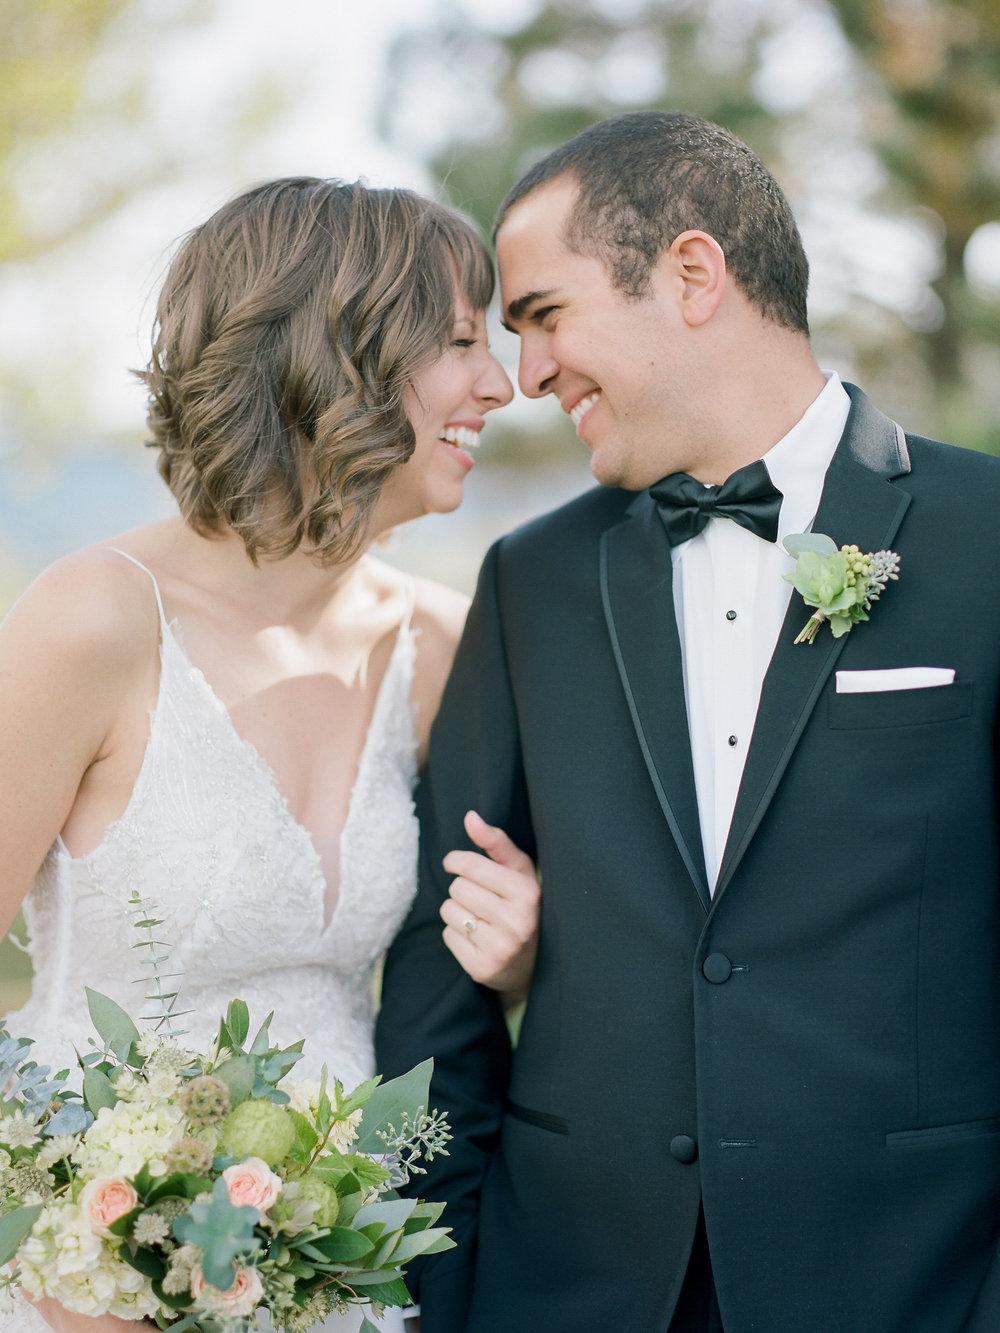 madeline-roberto-wedding-bride-groom-27.jpg